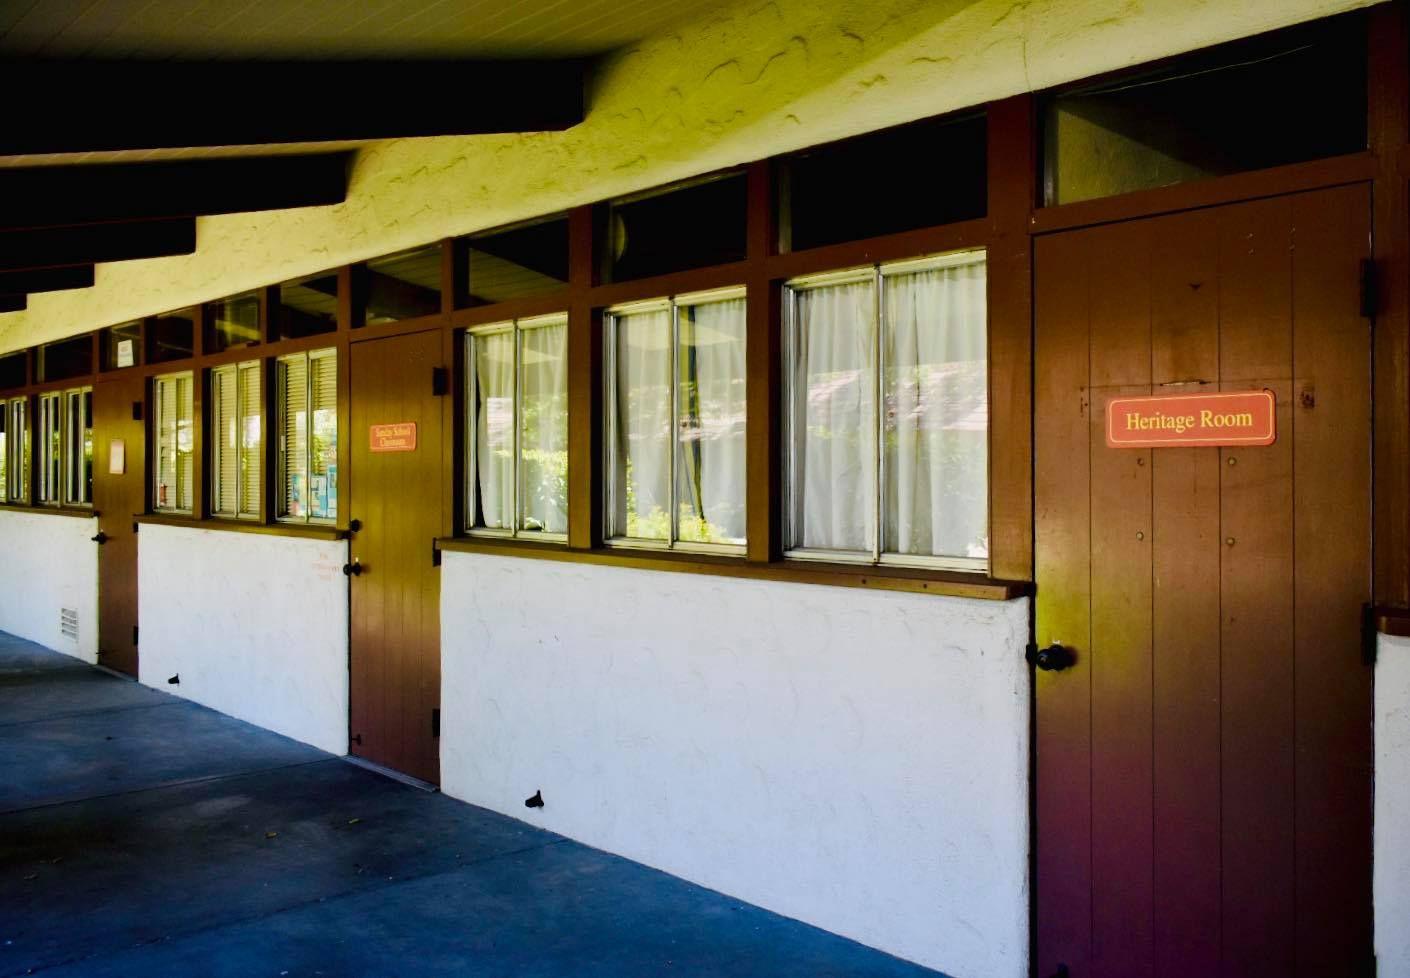 Exterior view of door labeled Heritage Room at Good Samaritan Church, San Jose CA